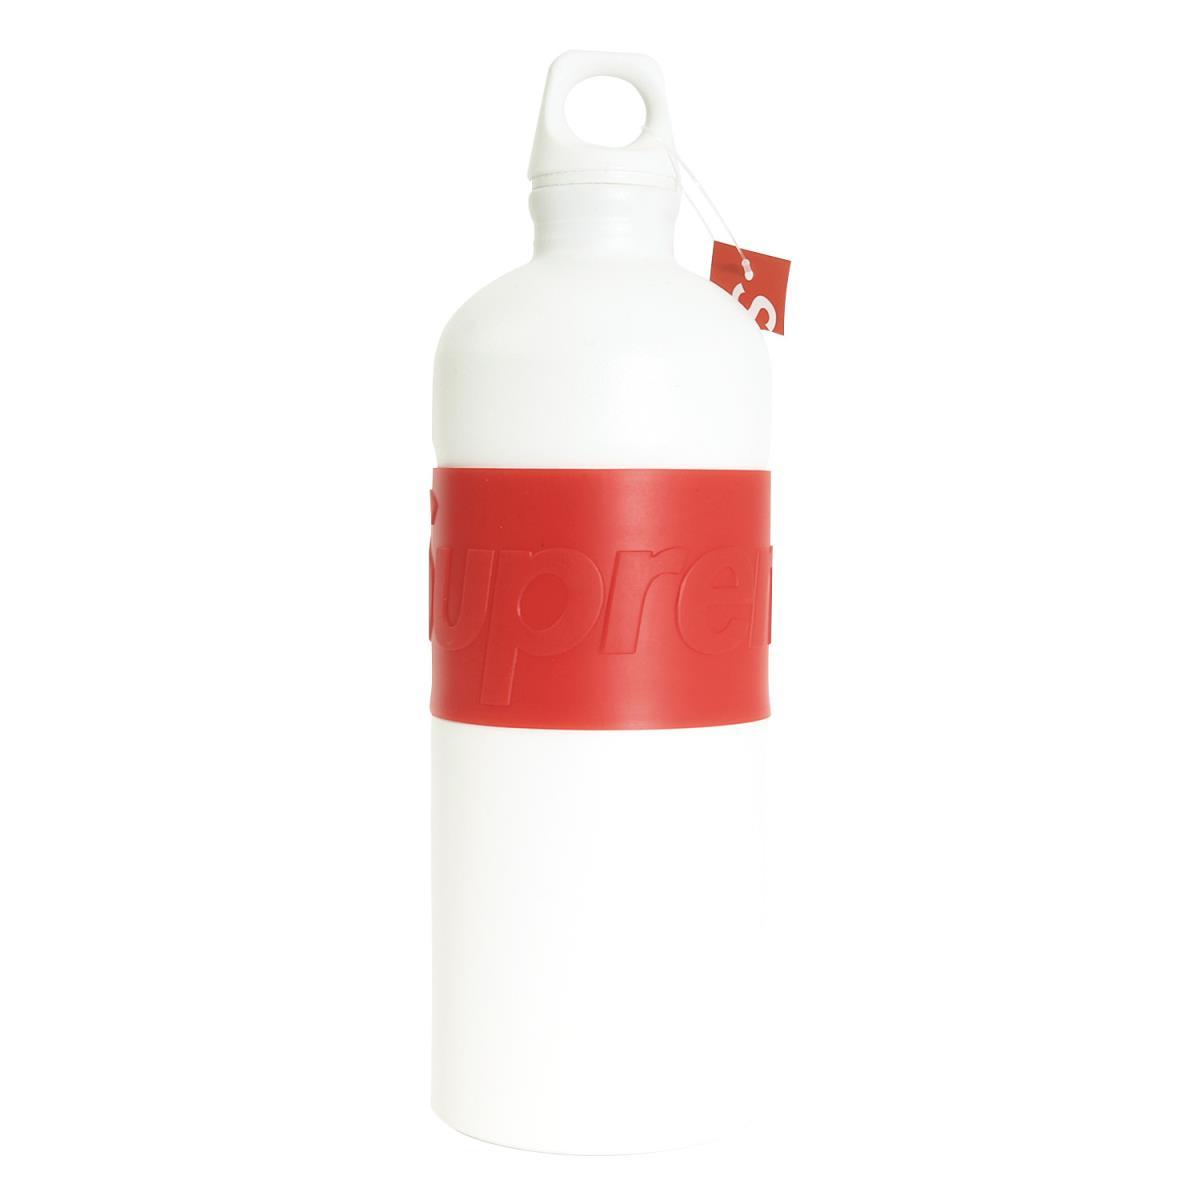 Supreme (シュプリーム) 19S/S ×SIGG ブランドロゴウォーターボトル(CYD 1.0L Water Bottle) ホワイト 【メンズ】【K2198】【あす楽☆対応可】